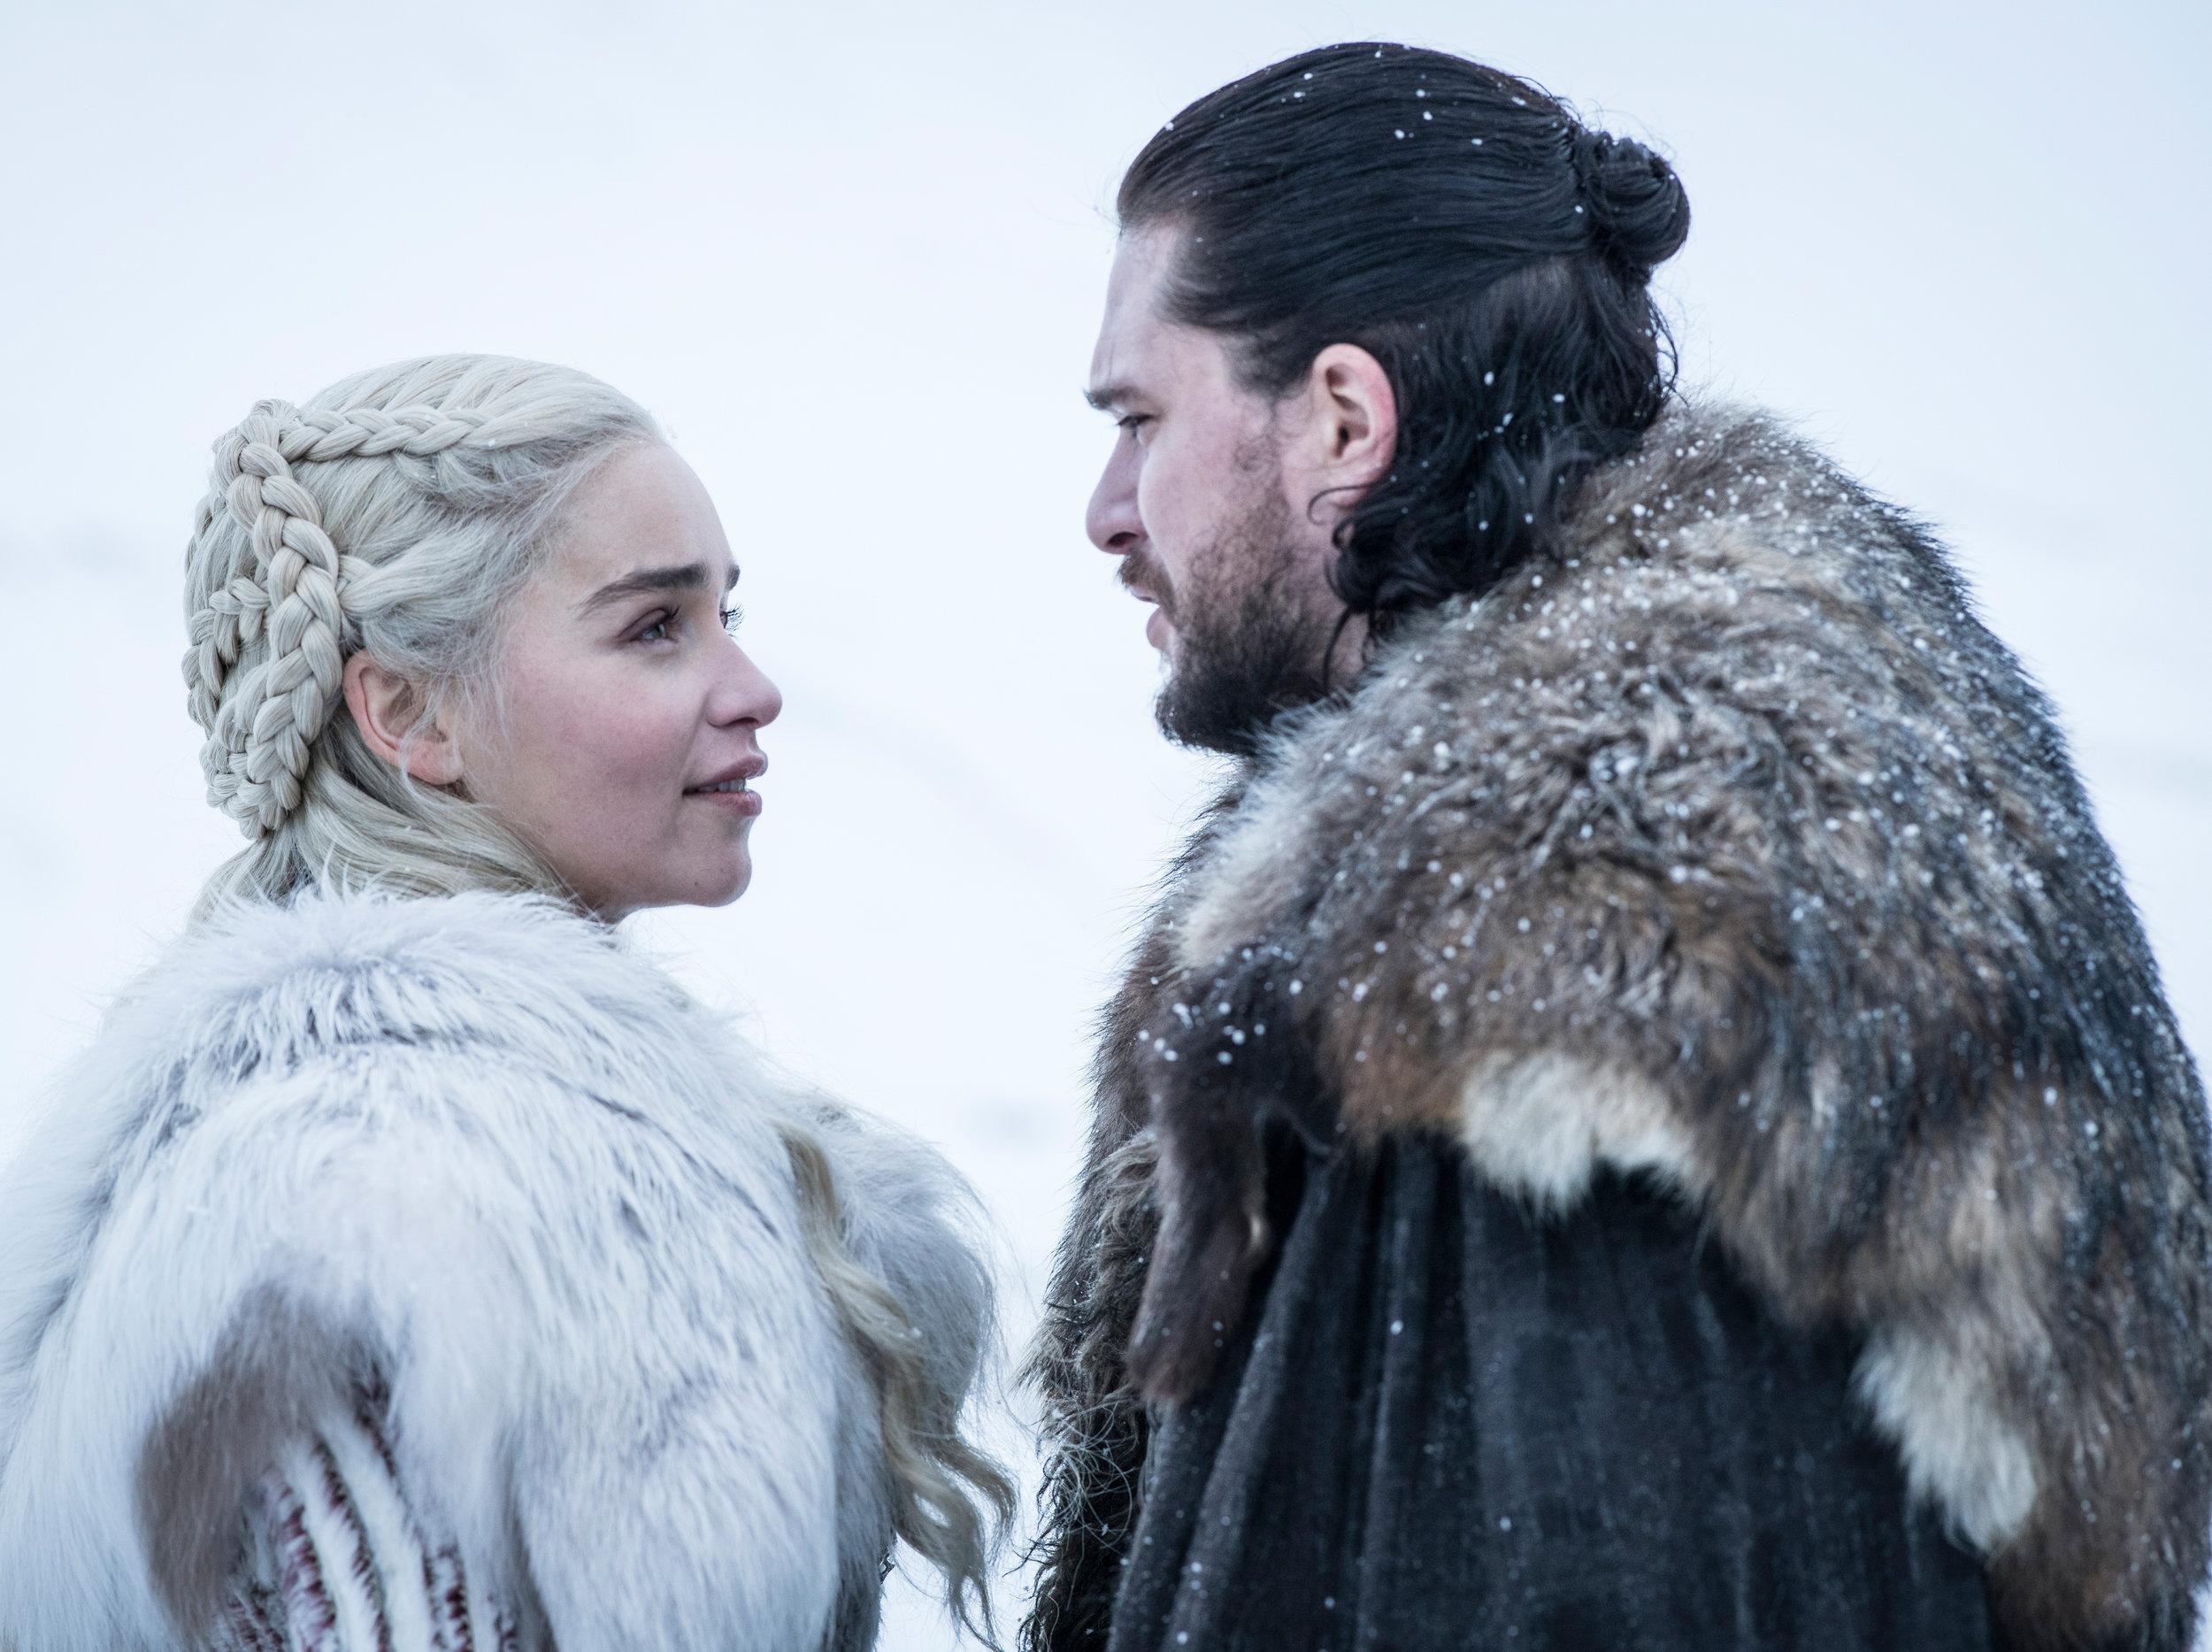 Emilia Clarke as Daenerys Targaryen and Kit Harington as Jon Snow – Photo: Helen Sloan/HBO